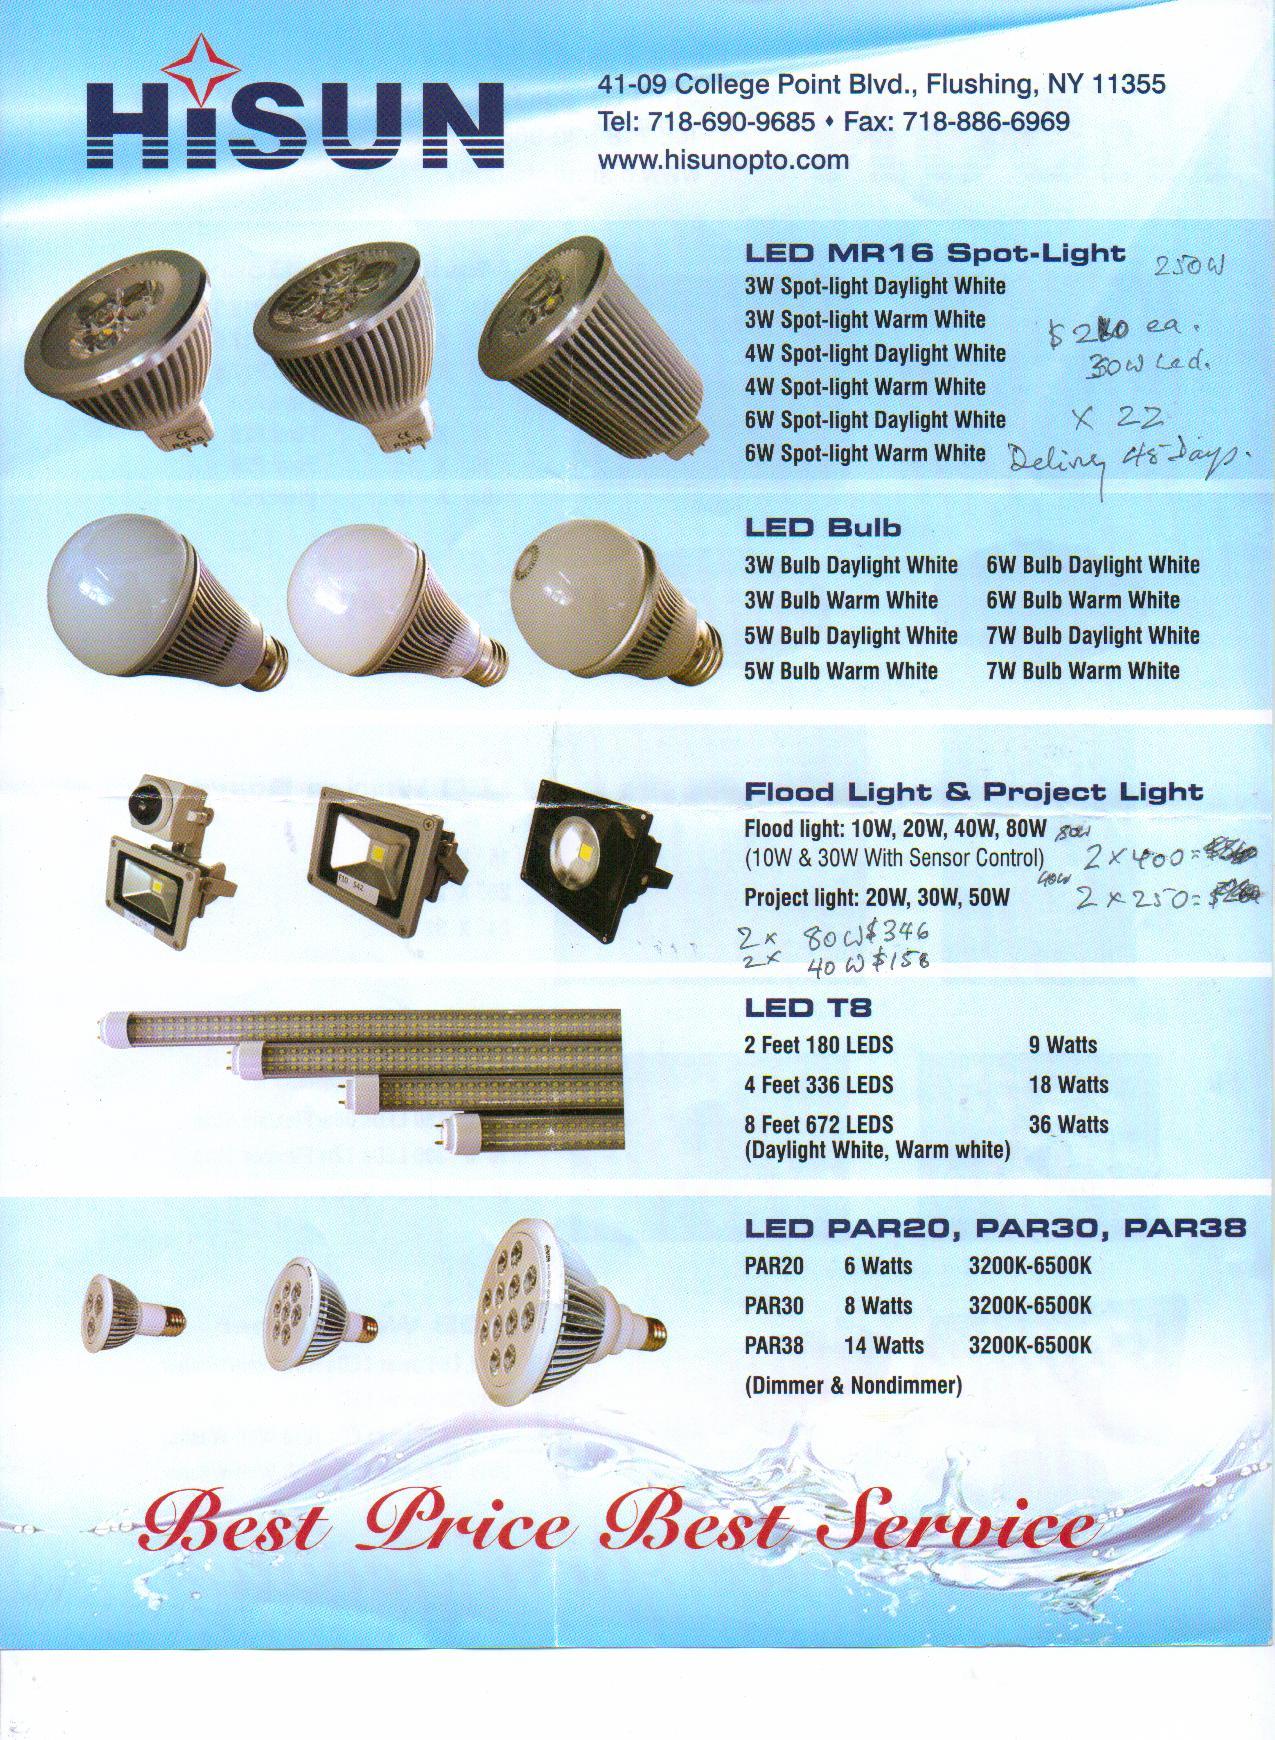 HISUN LED energy efficient lighting